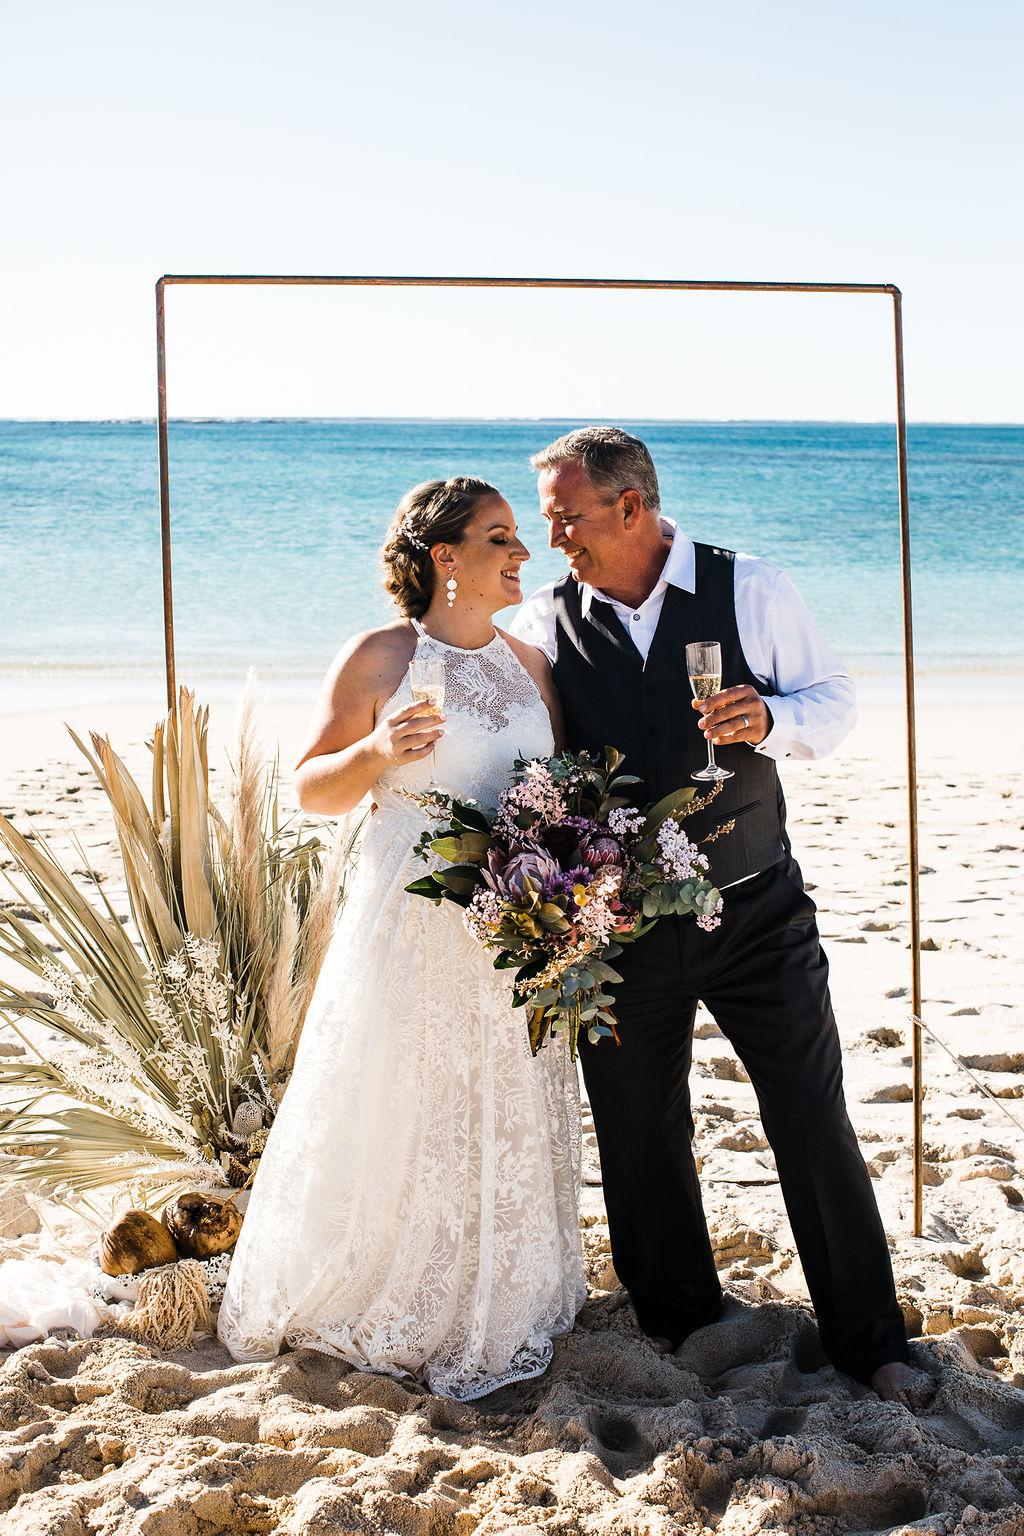 R&G-elope-to-ningaloo-exmouth-blue-media-weddings-turquoisebay-160.jpg